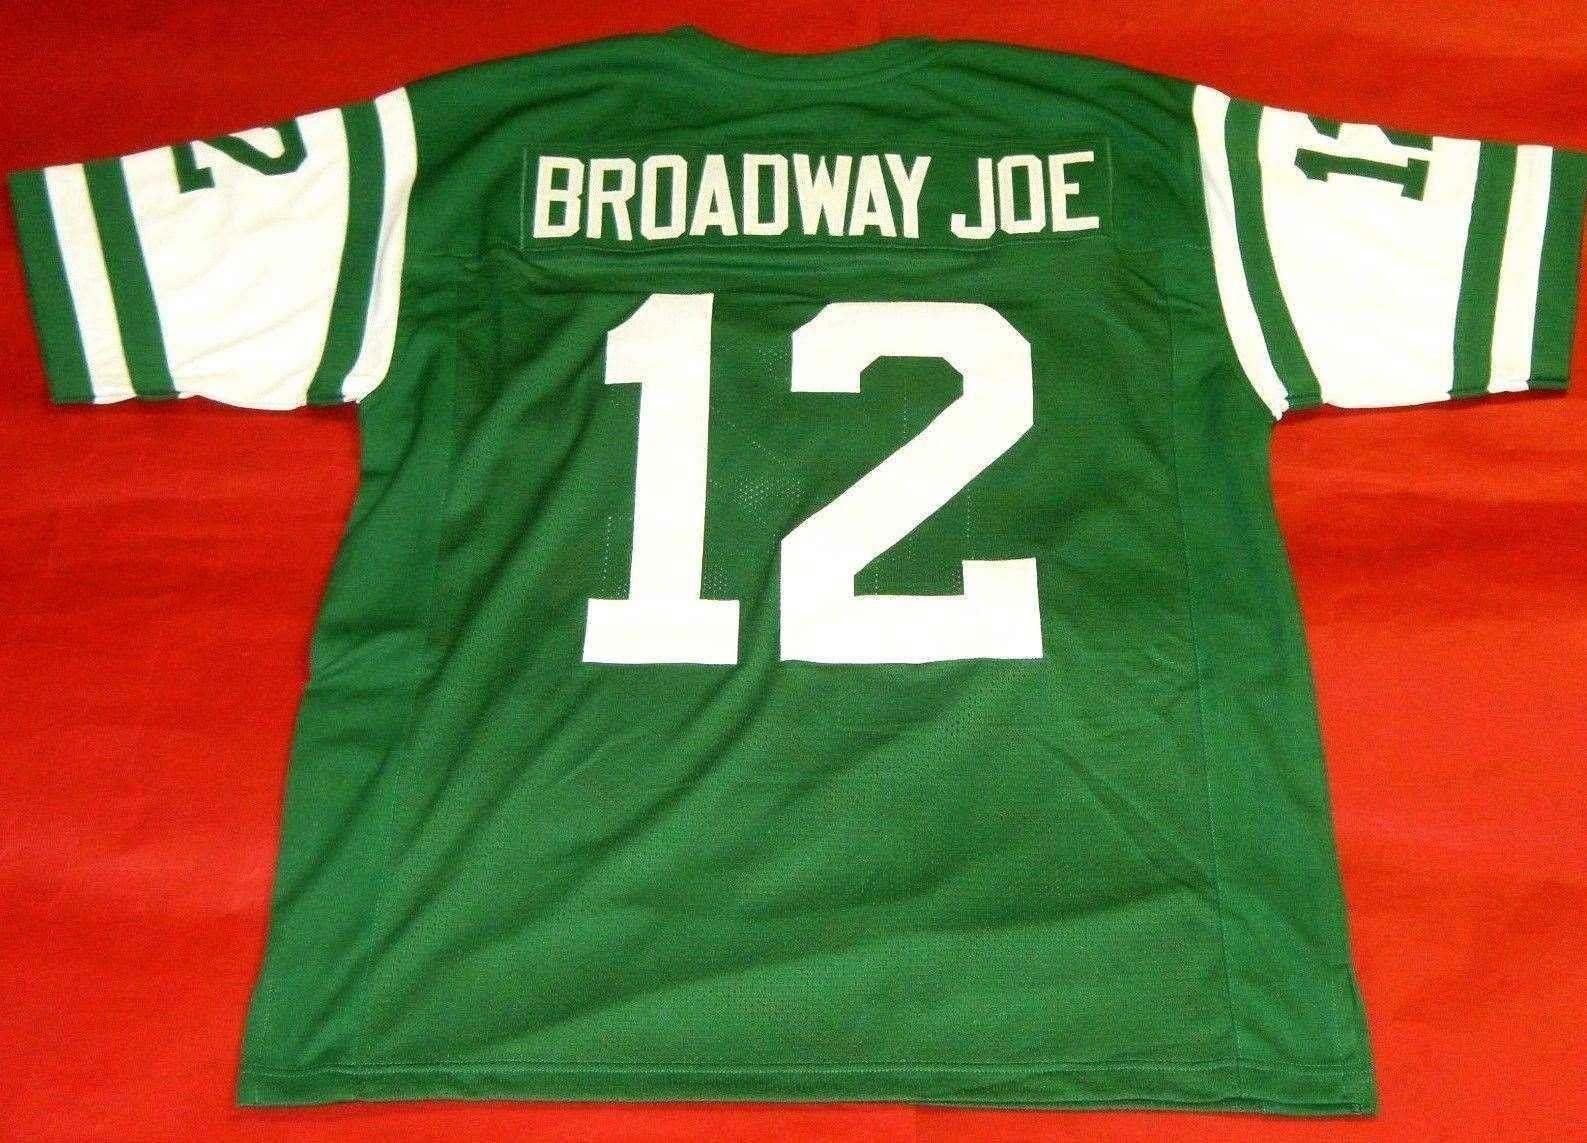 buy online db4a2 862d6 Cheap retro #12 JOE NAMATH CUSTOM MITCHELL & NESS Jersey BROADWAY JOE green  Mens Stitching High-end Size S-5XL Football Jerseys College NCAA